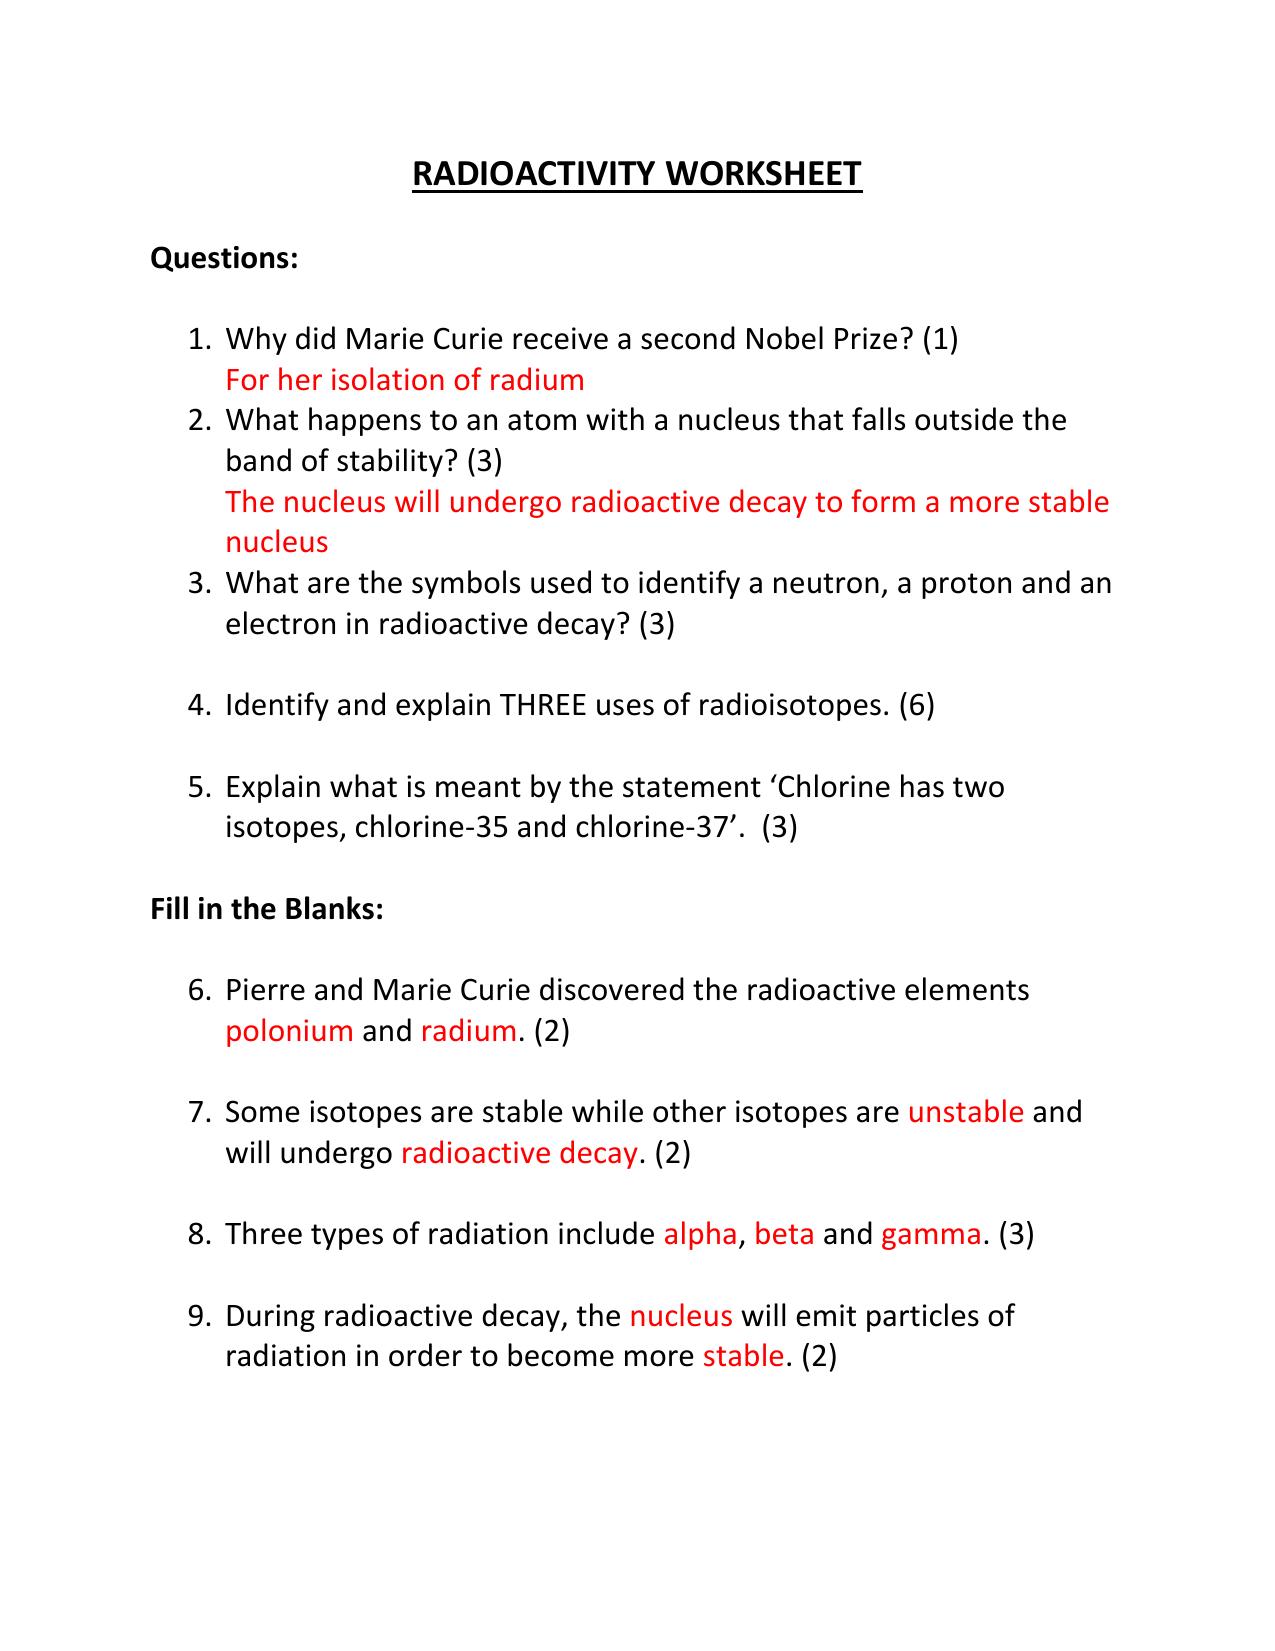 Radioactivity Worksheet Answers